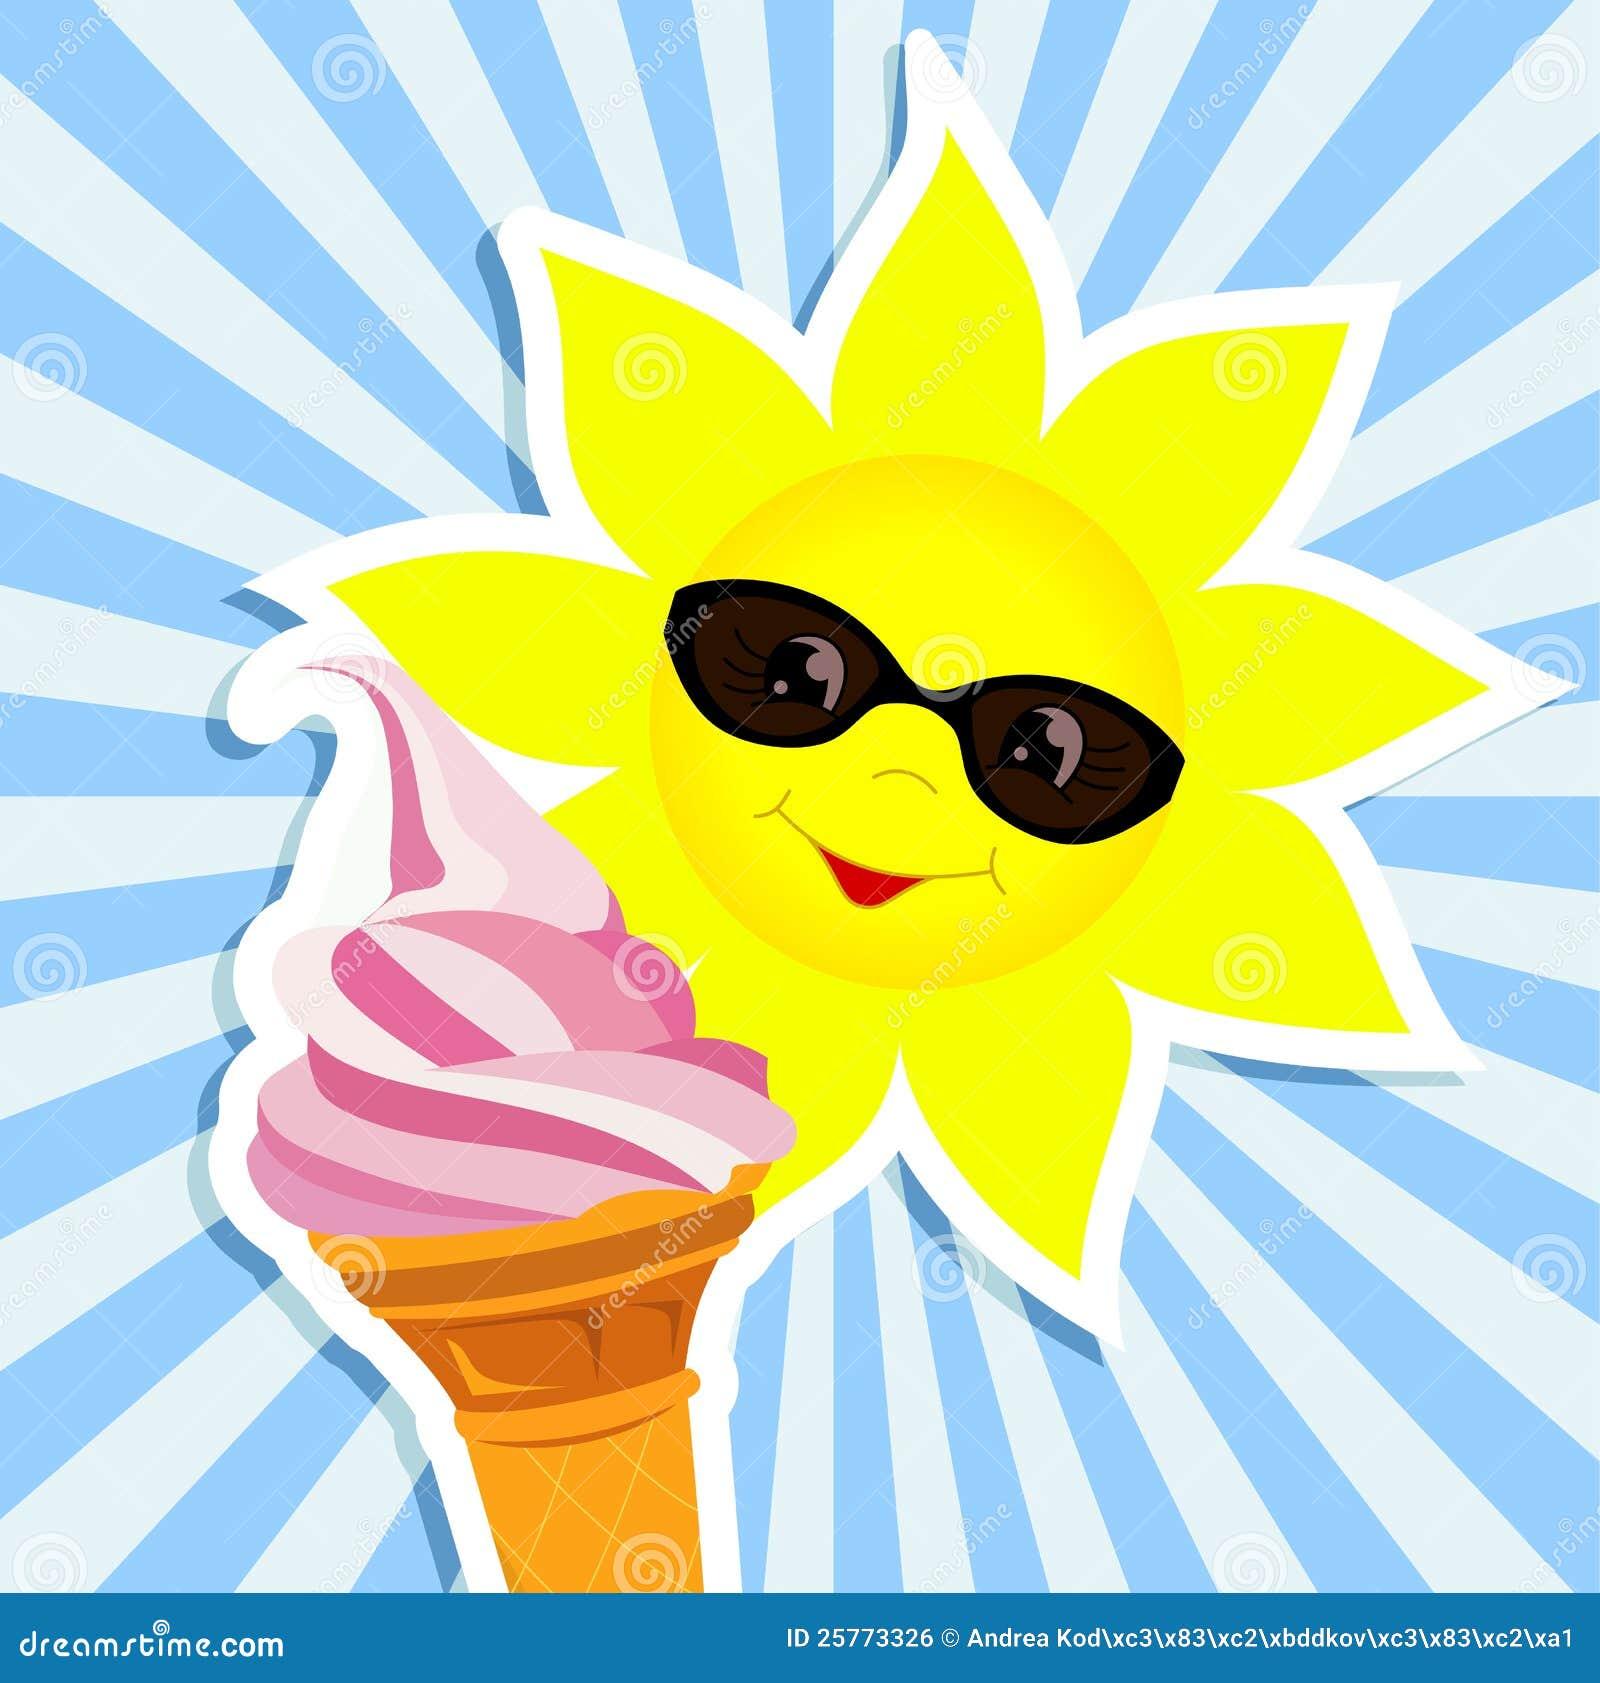 Sun with pink ice cream